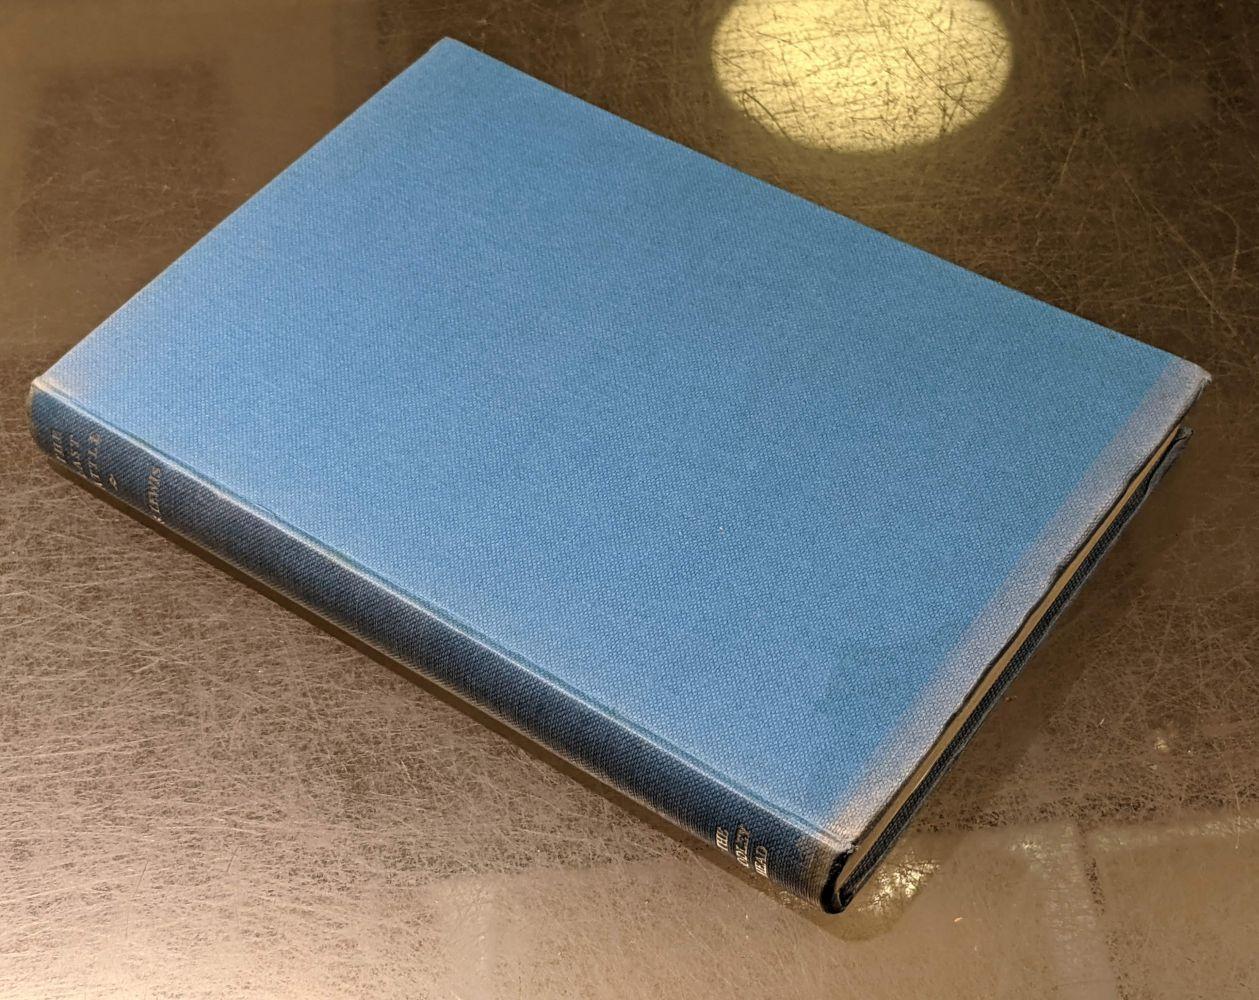 Lewis (C.S.) The Last Battle, 1st edition, 1956 - Image 4 of 9